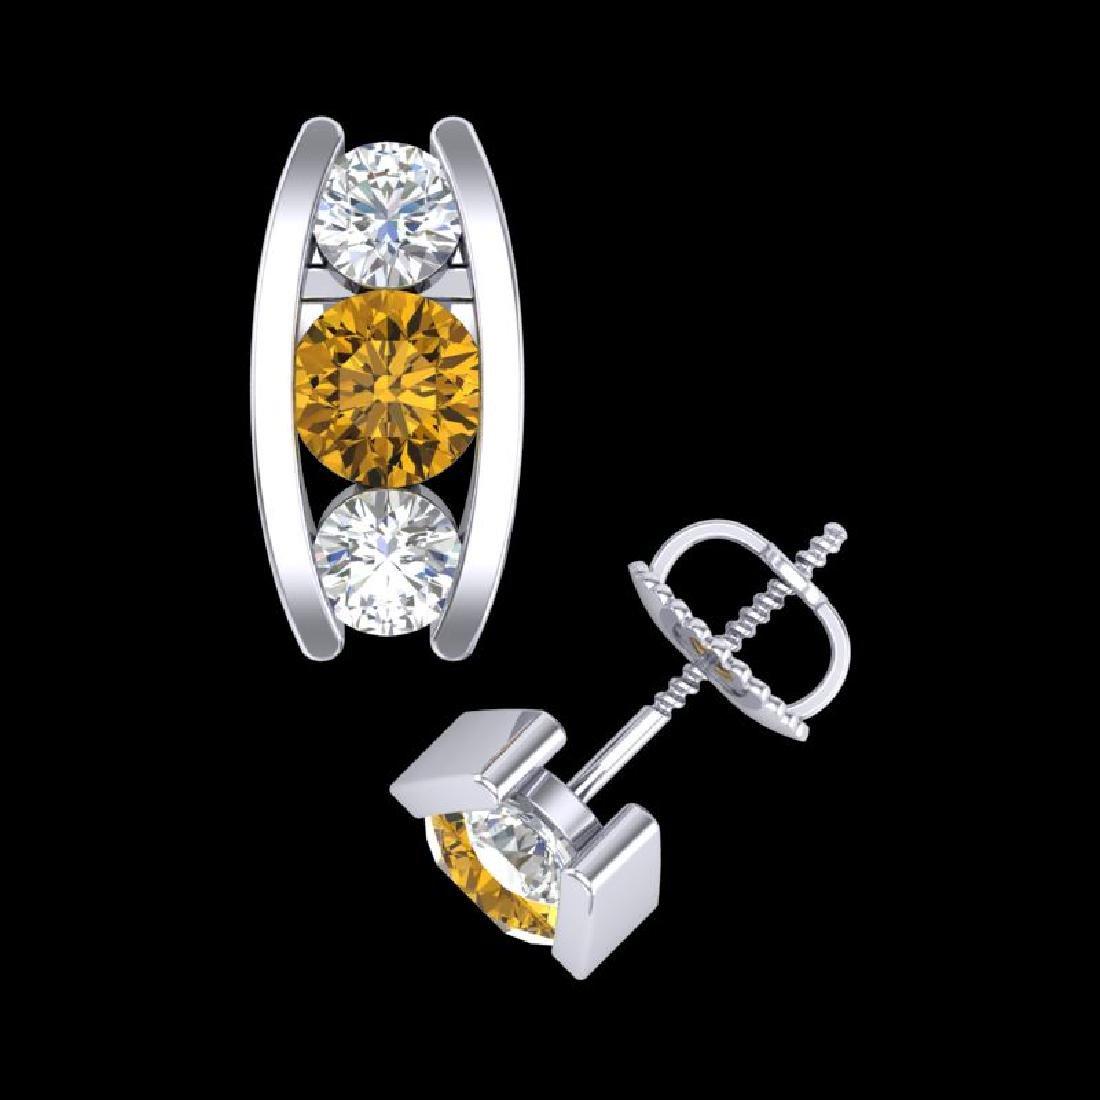 2.18 CTW Intense Fancy Yellow Diamond Art Deco Stud - 3